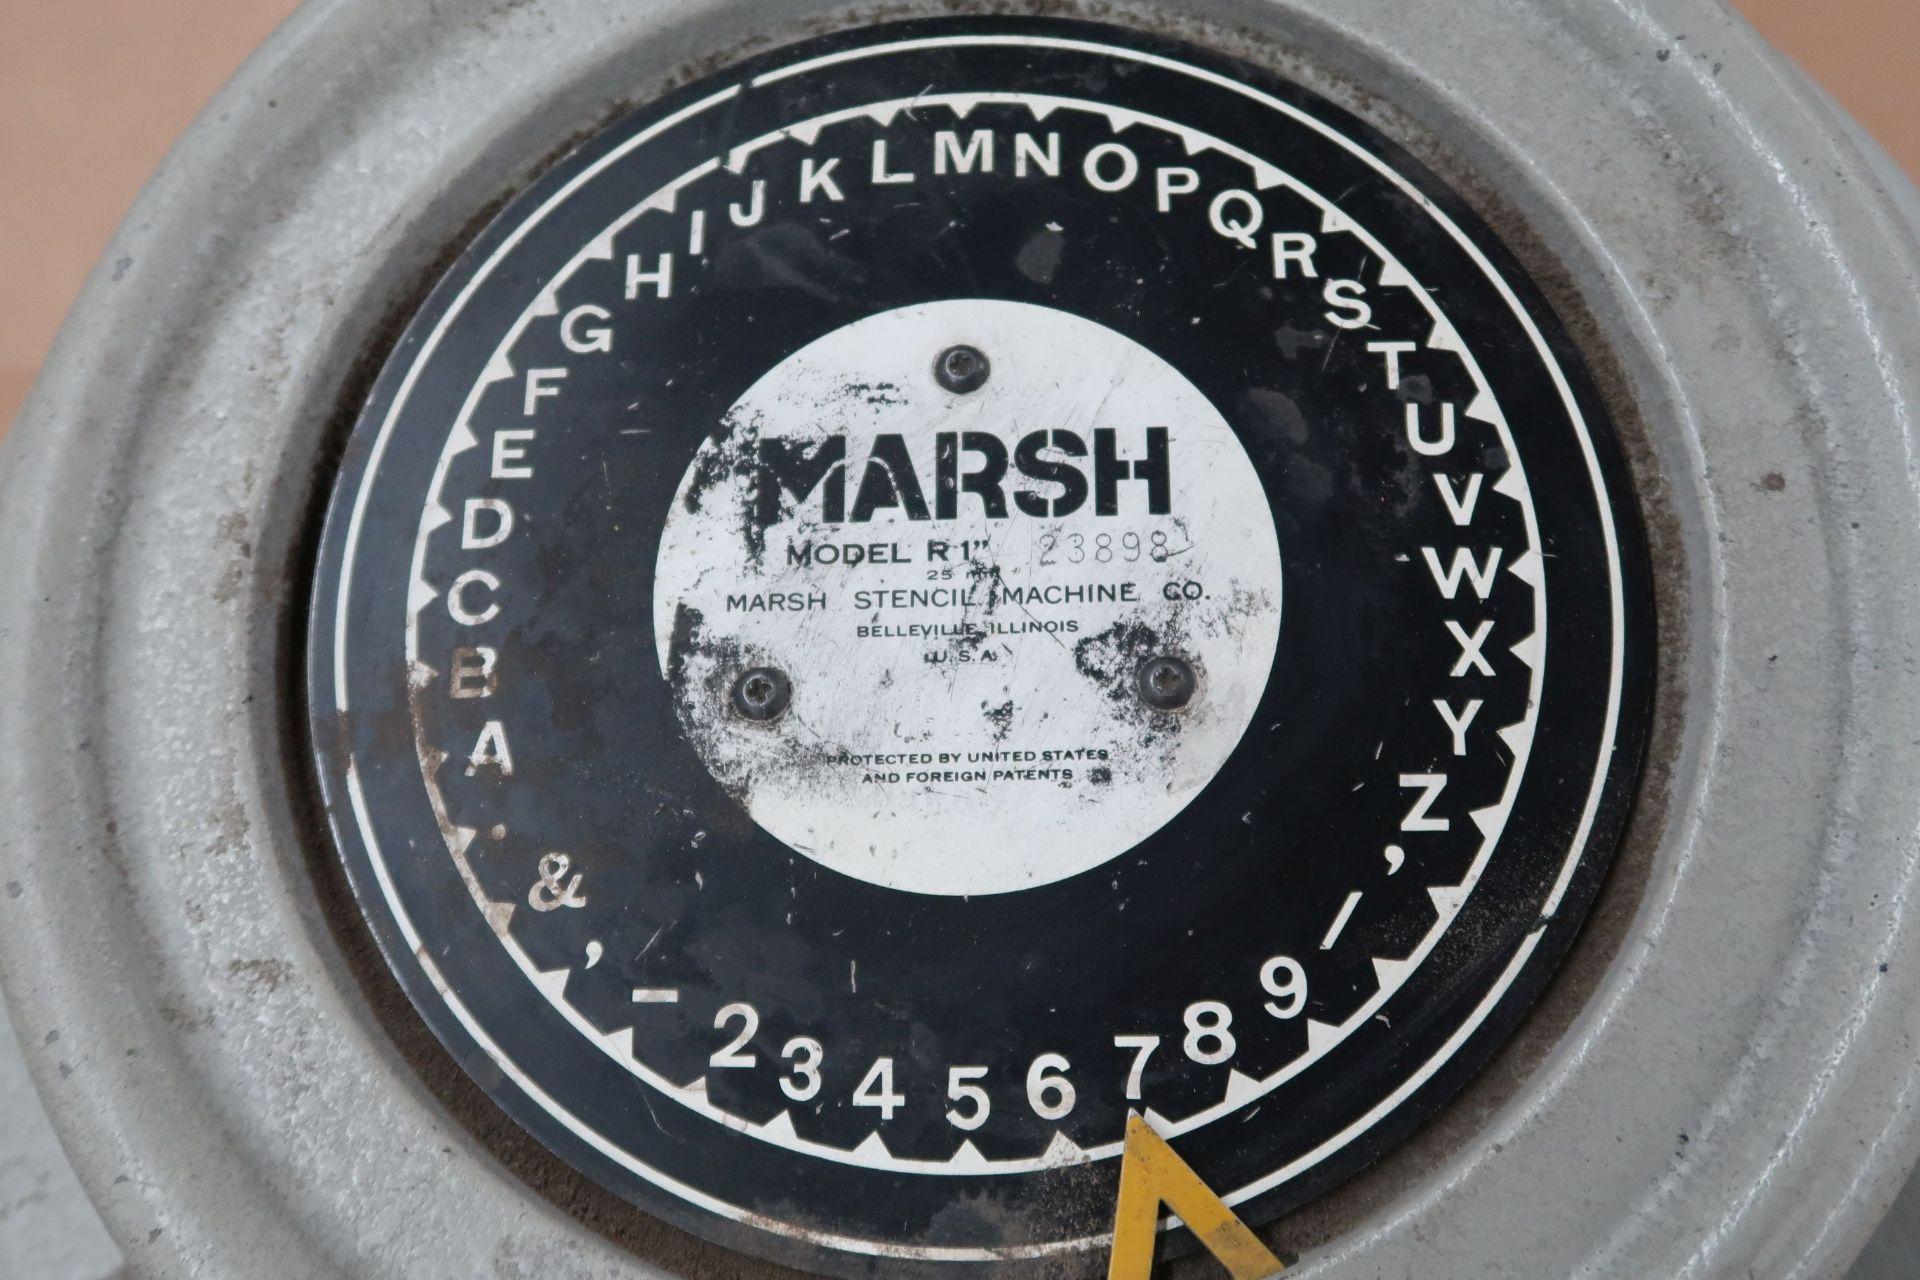 "MARSH MODEL R-1"" STENCIL MACHINE; S/N 23898 - Image 2 of 3"